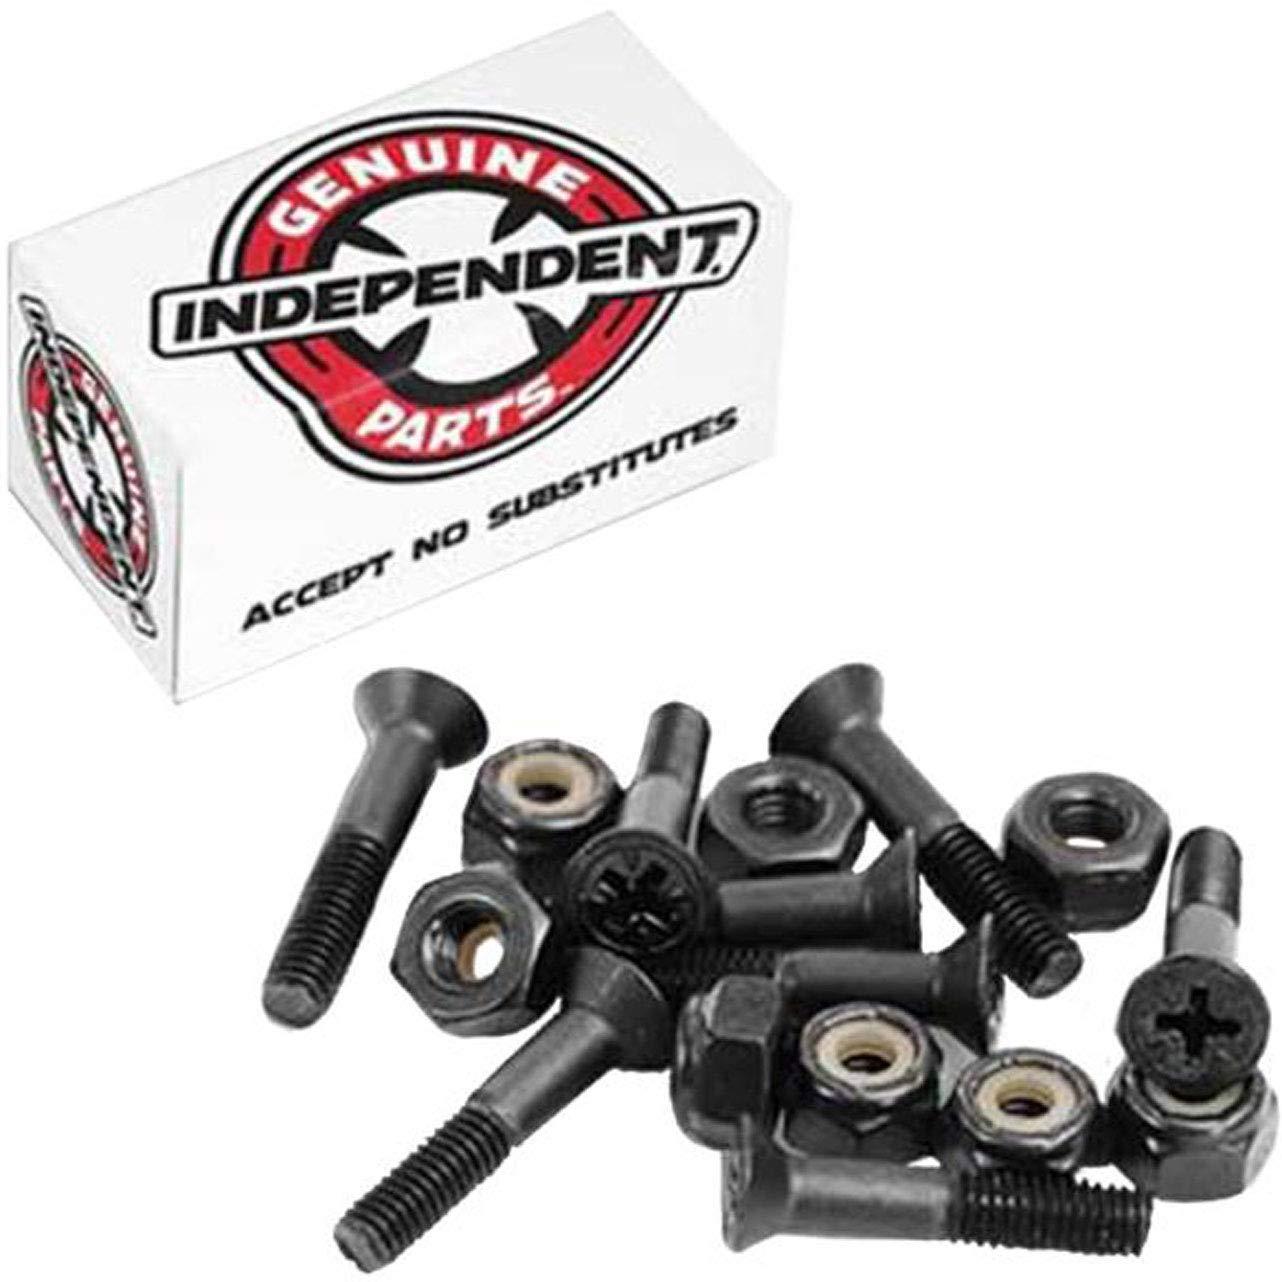 Independent Genuine Parts Cross Bolts Standard Phillips Skateboard Hardware (Black/Red, 1'') by Independent (Image #1)